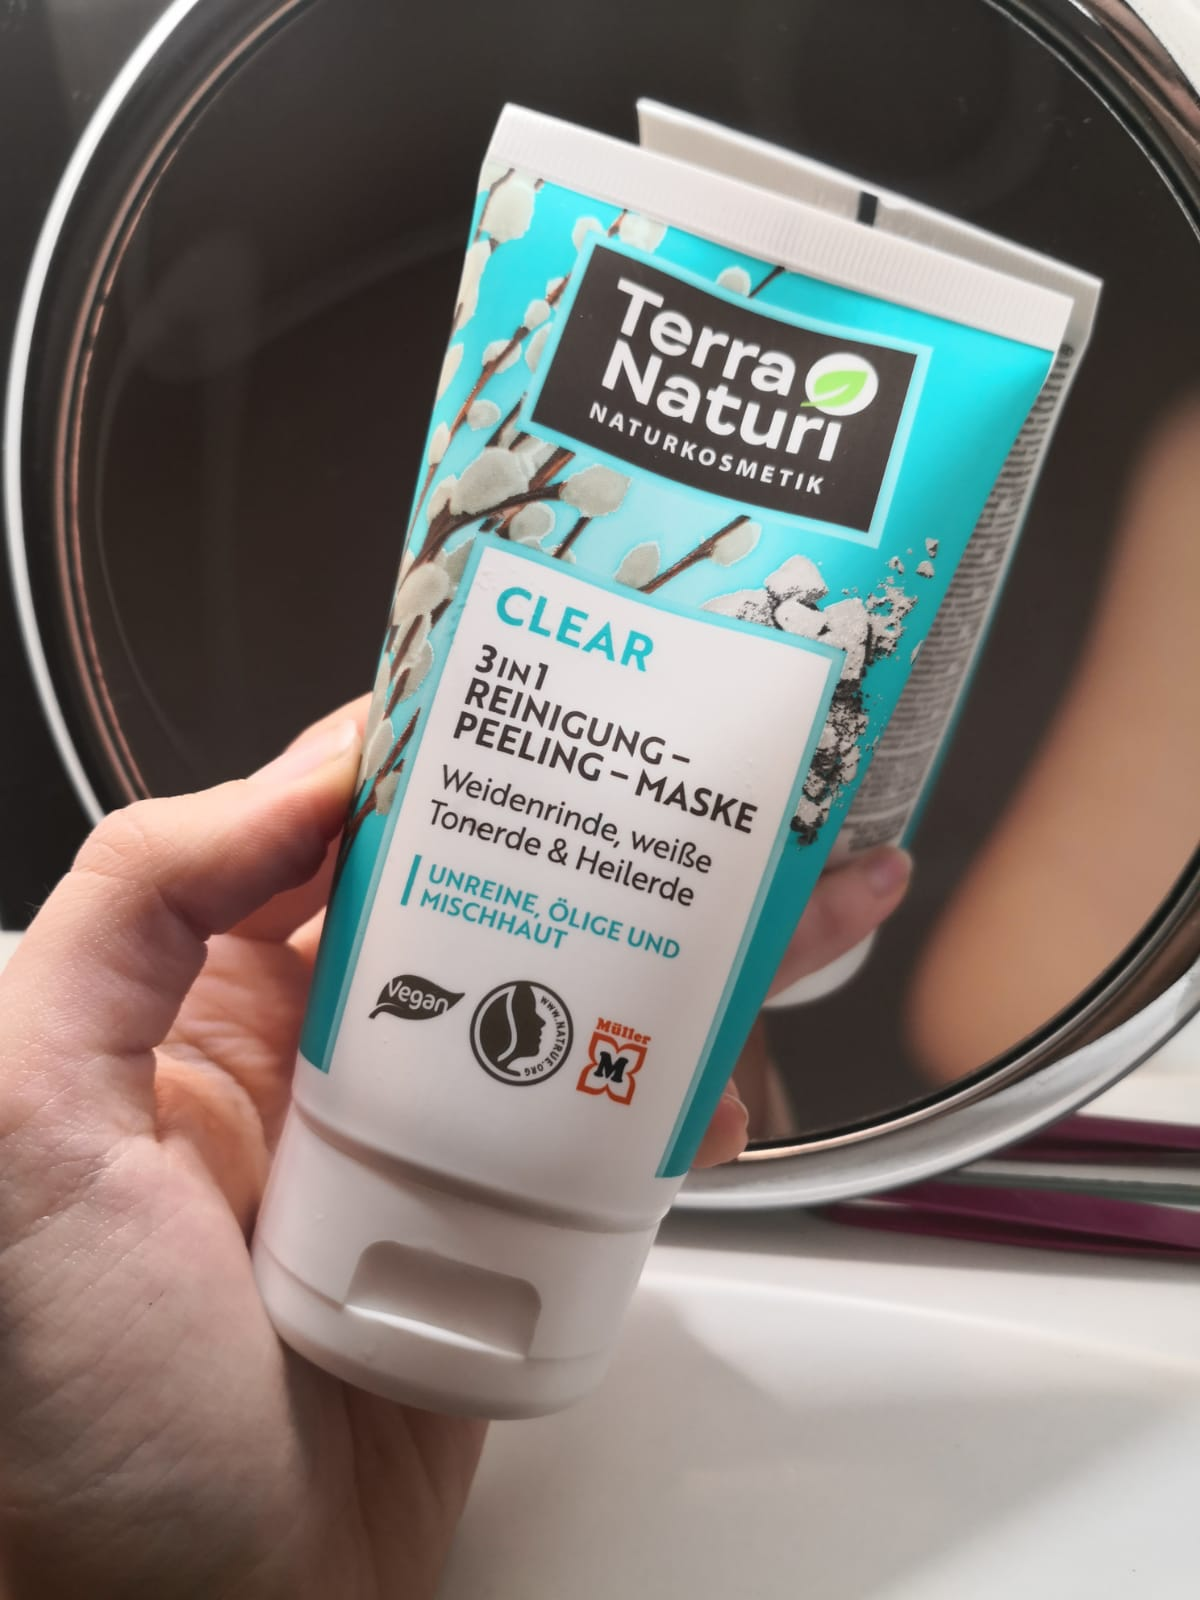 Terra Naturi Clear gel za čišćenje lica recenzija – piling/maska vrbina kora i ljekovita zemlja